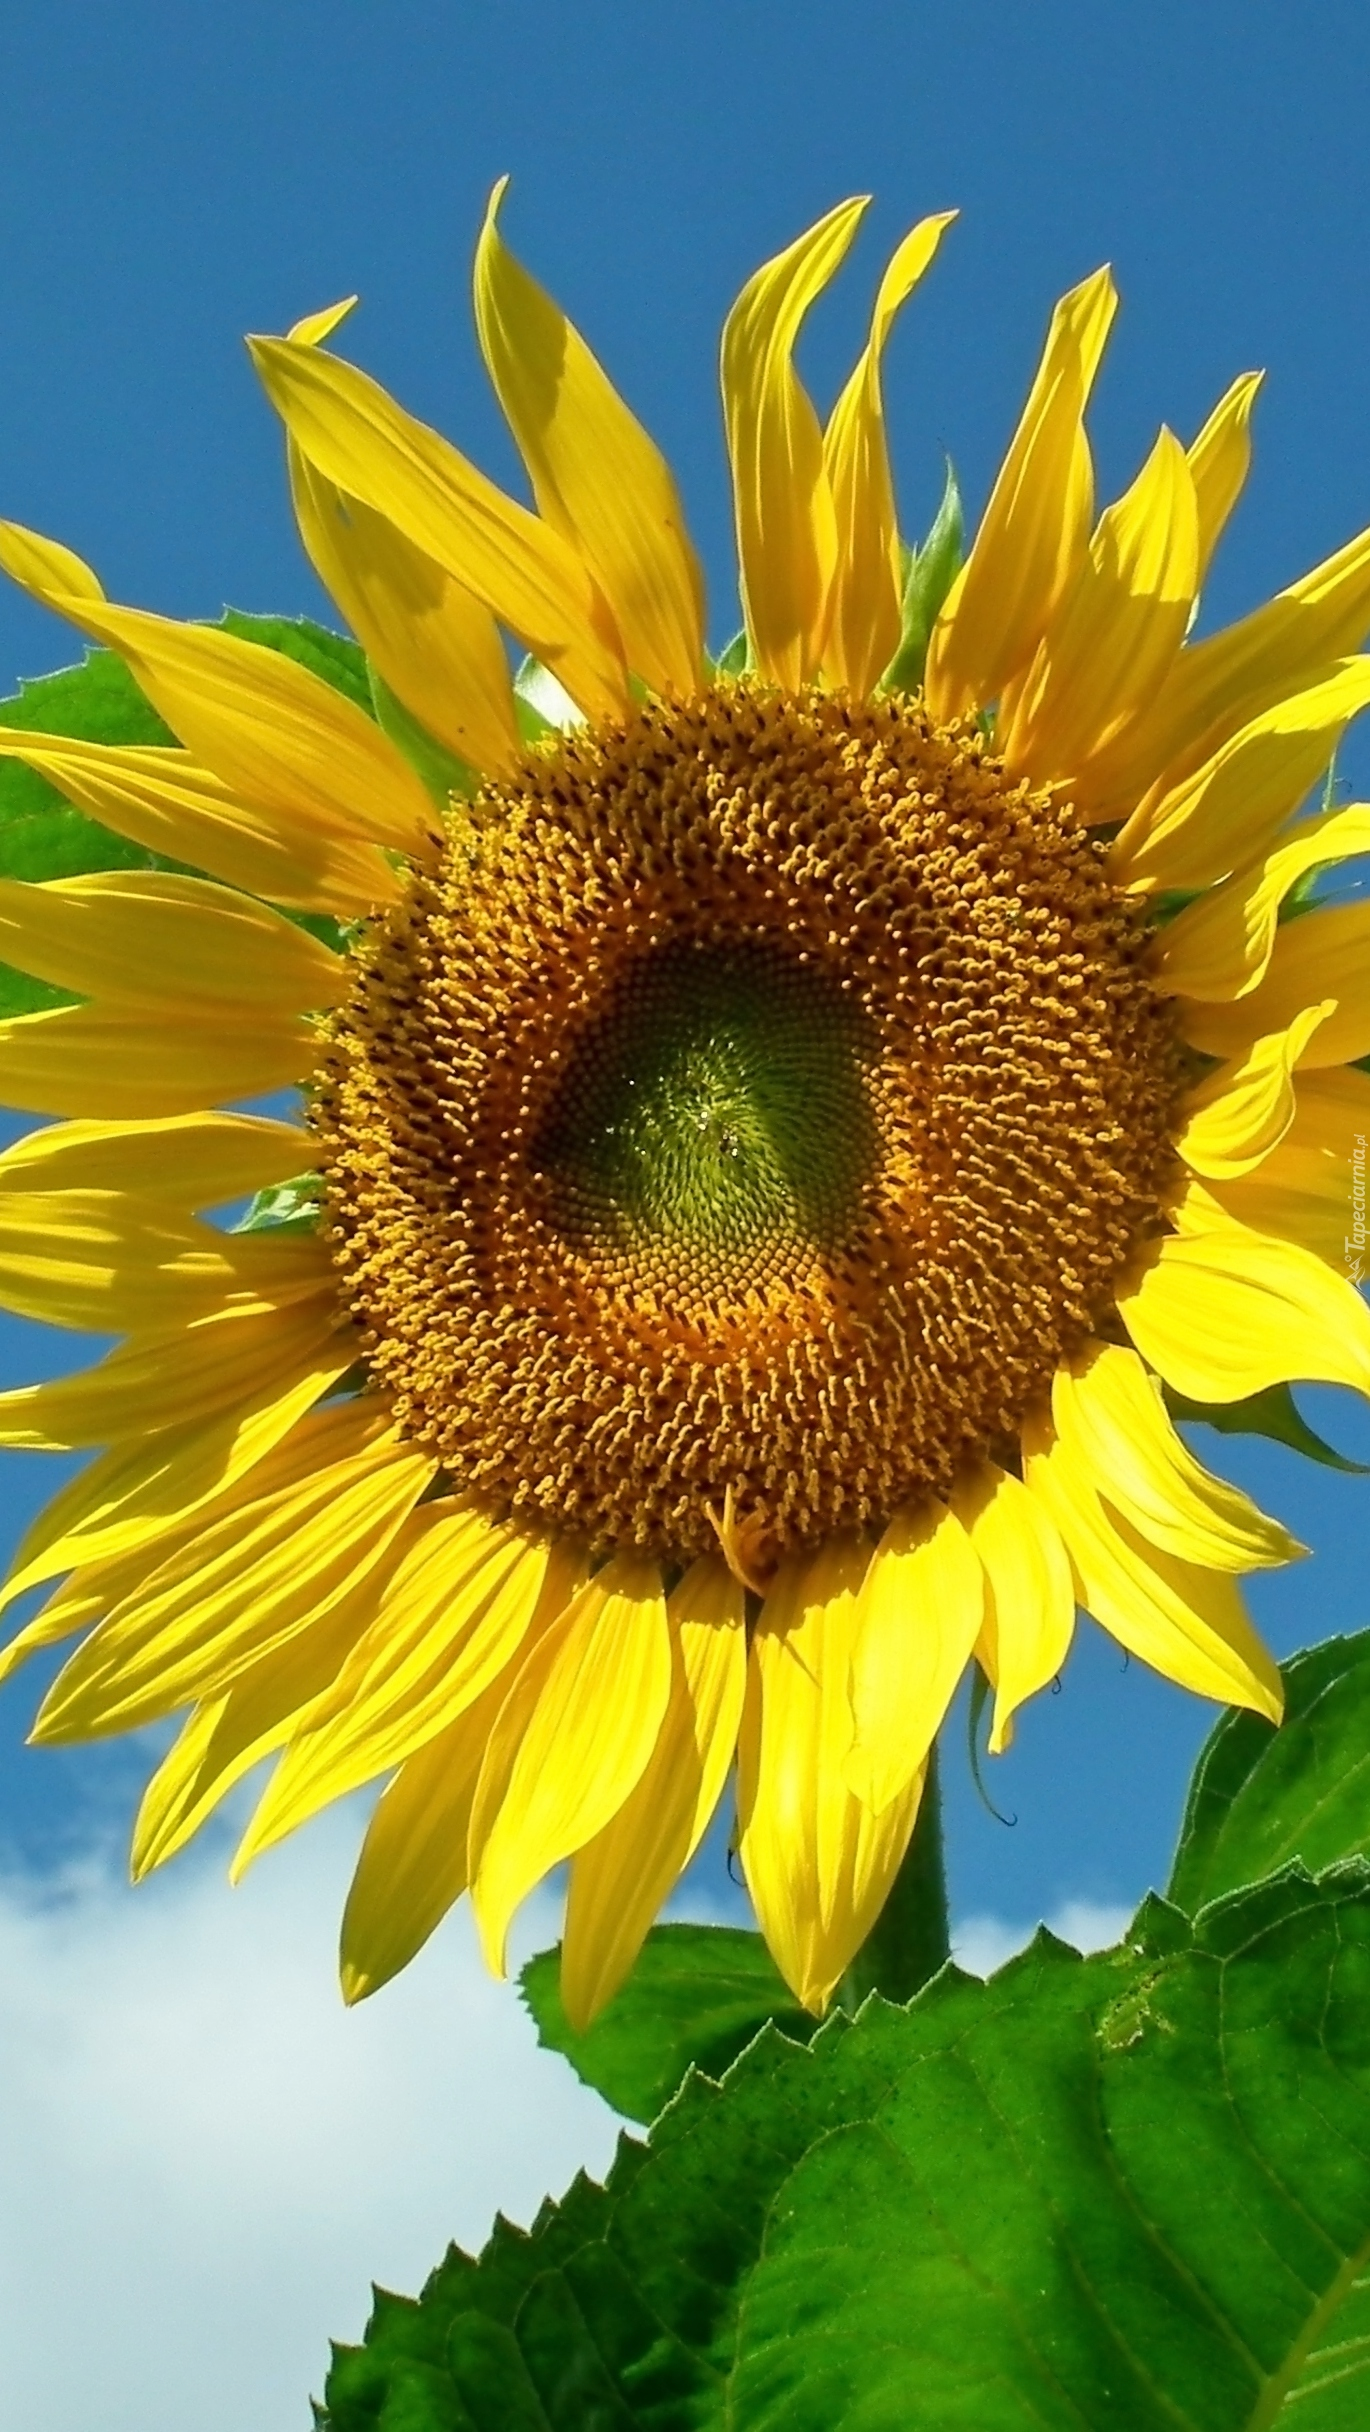 Słonecznik w blasku słońca